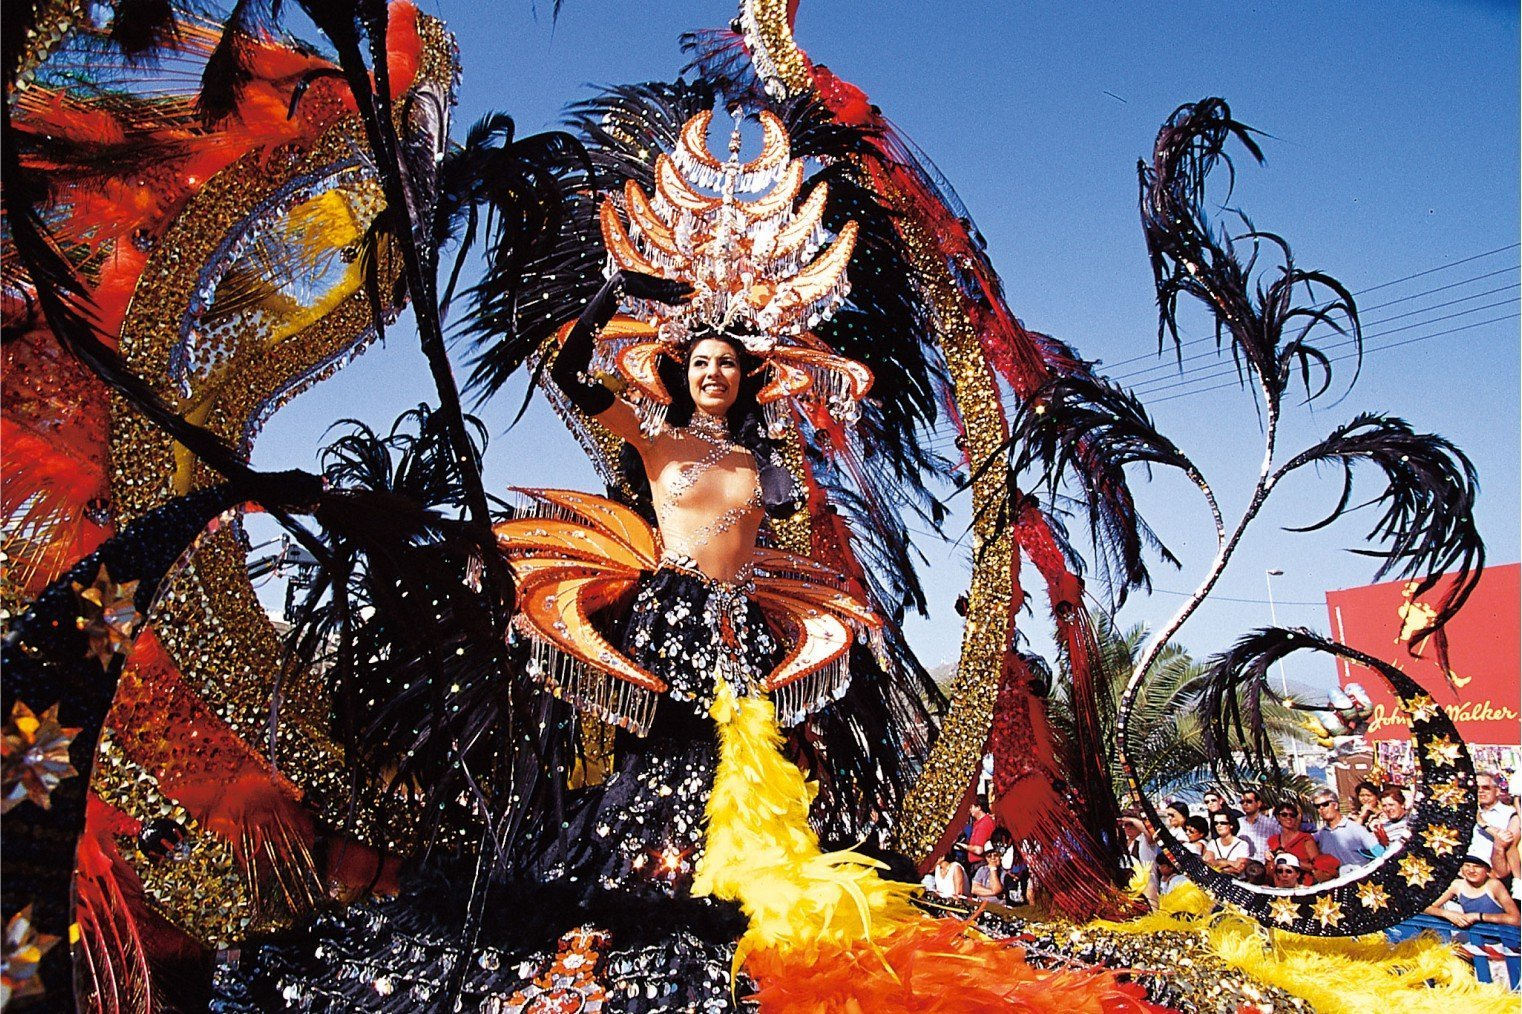 Carnival of Santa Cruz de Tenerife, Spain. Карнавал в Санта Крус де Тенерифе.